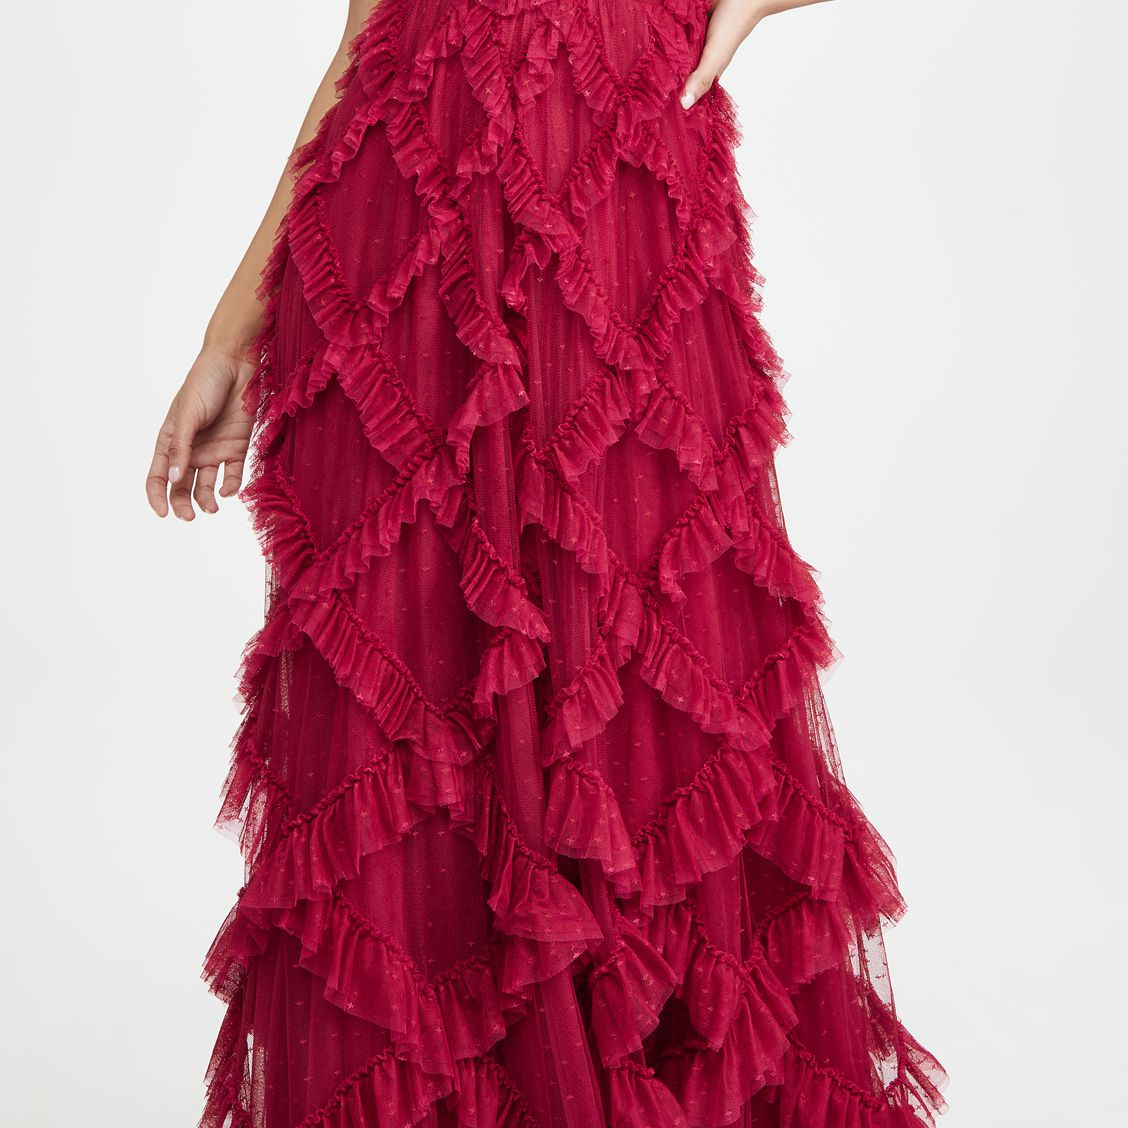 Needle & Thread Genevieve Ruffle Gown, $669